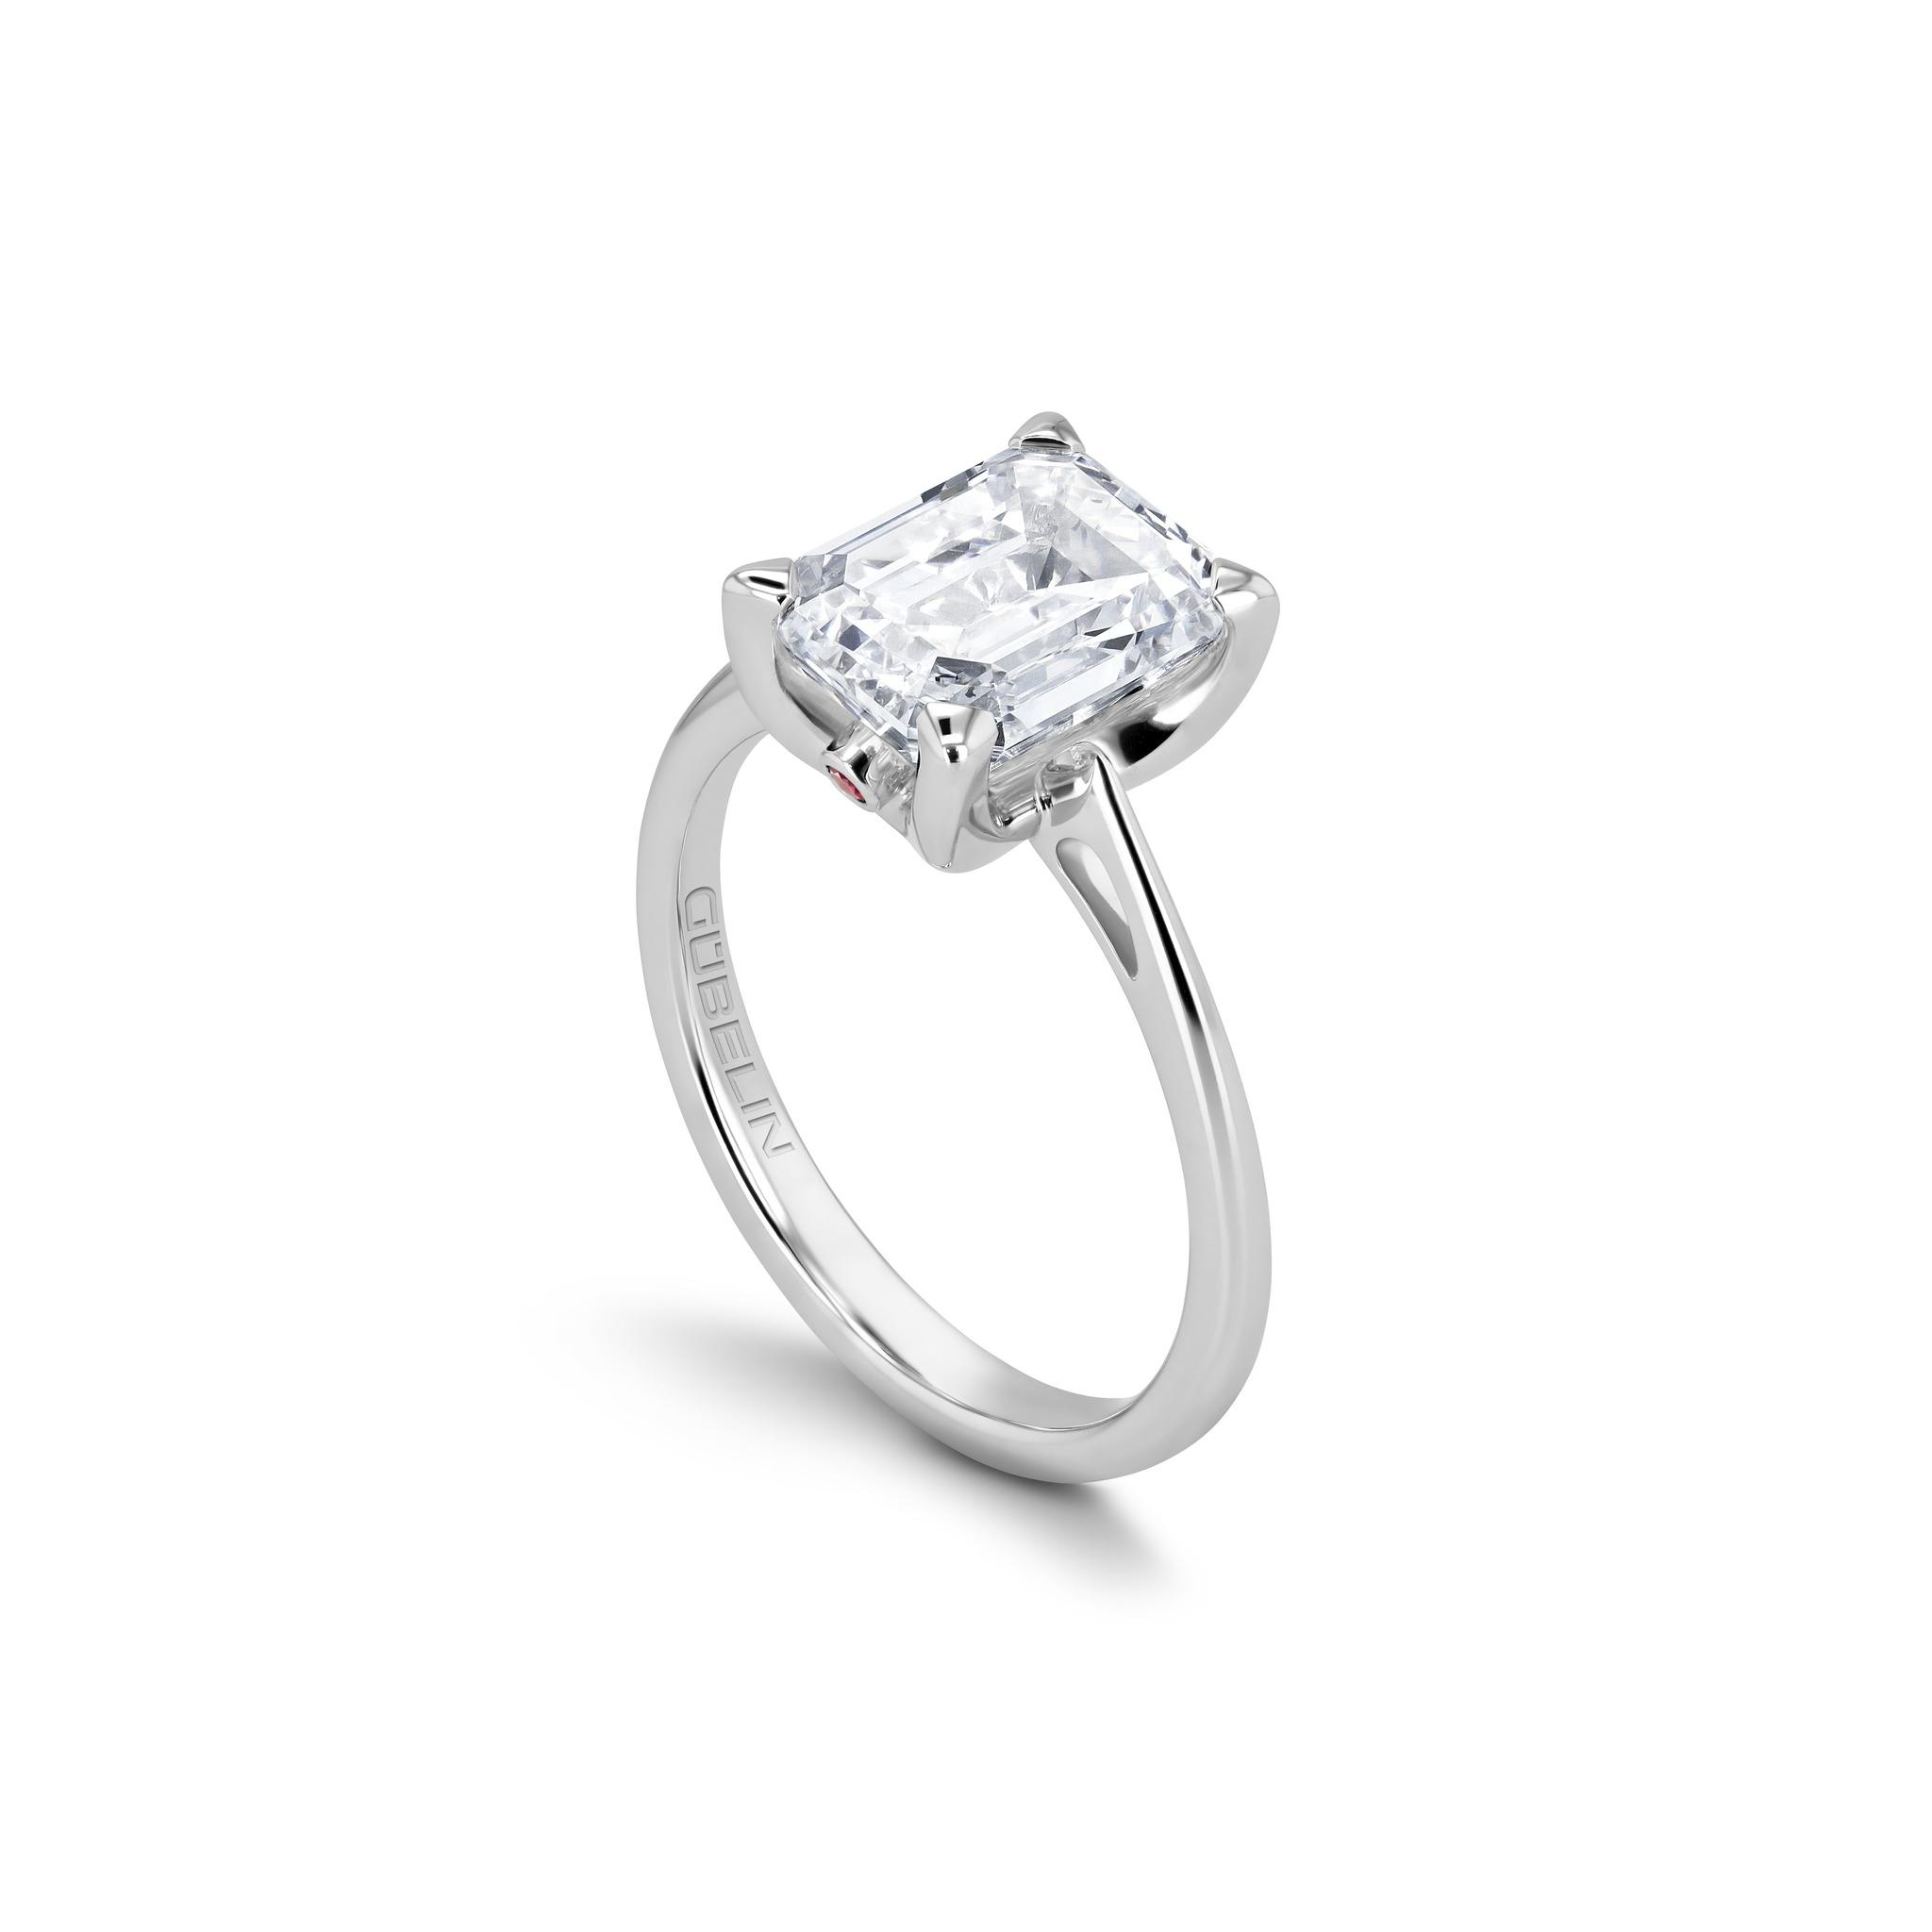 Solitär Ring mit Diamant